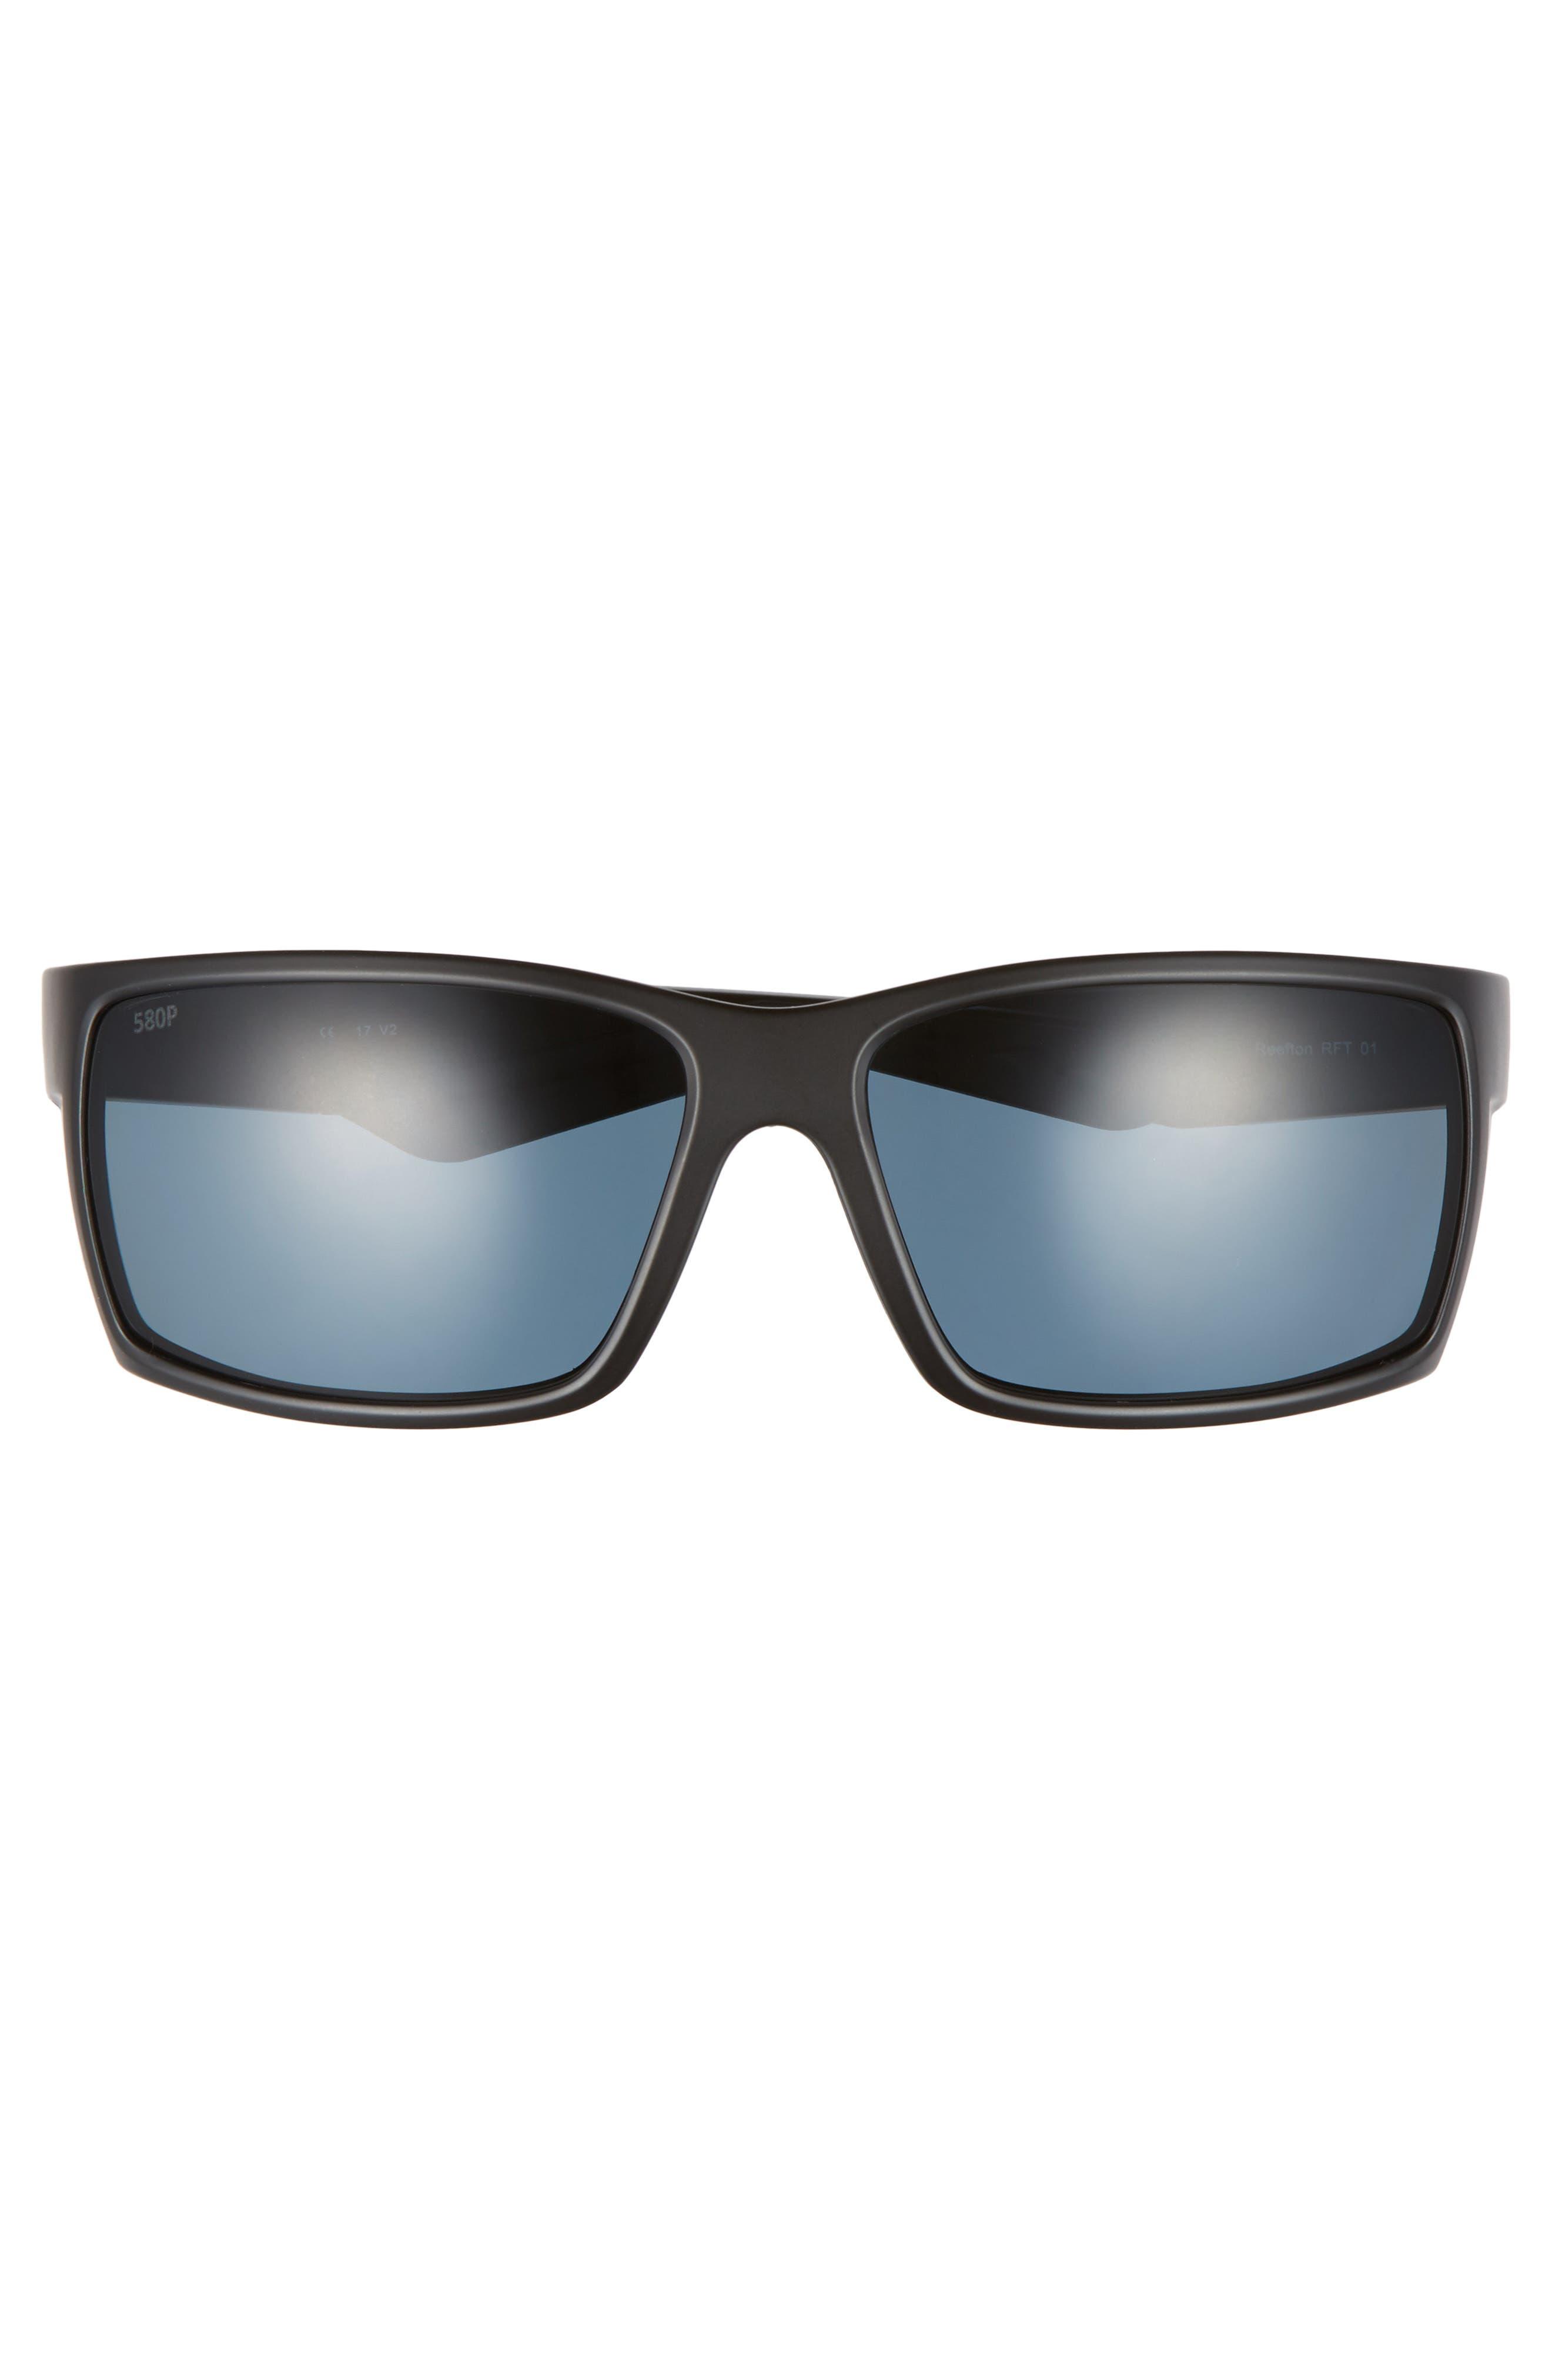 Reefton 65mm Polarized Sunglasses,                             Alternate thumbnail 2, color,                             001